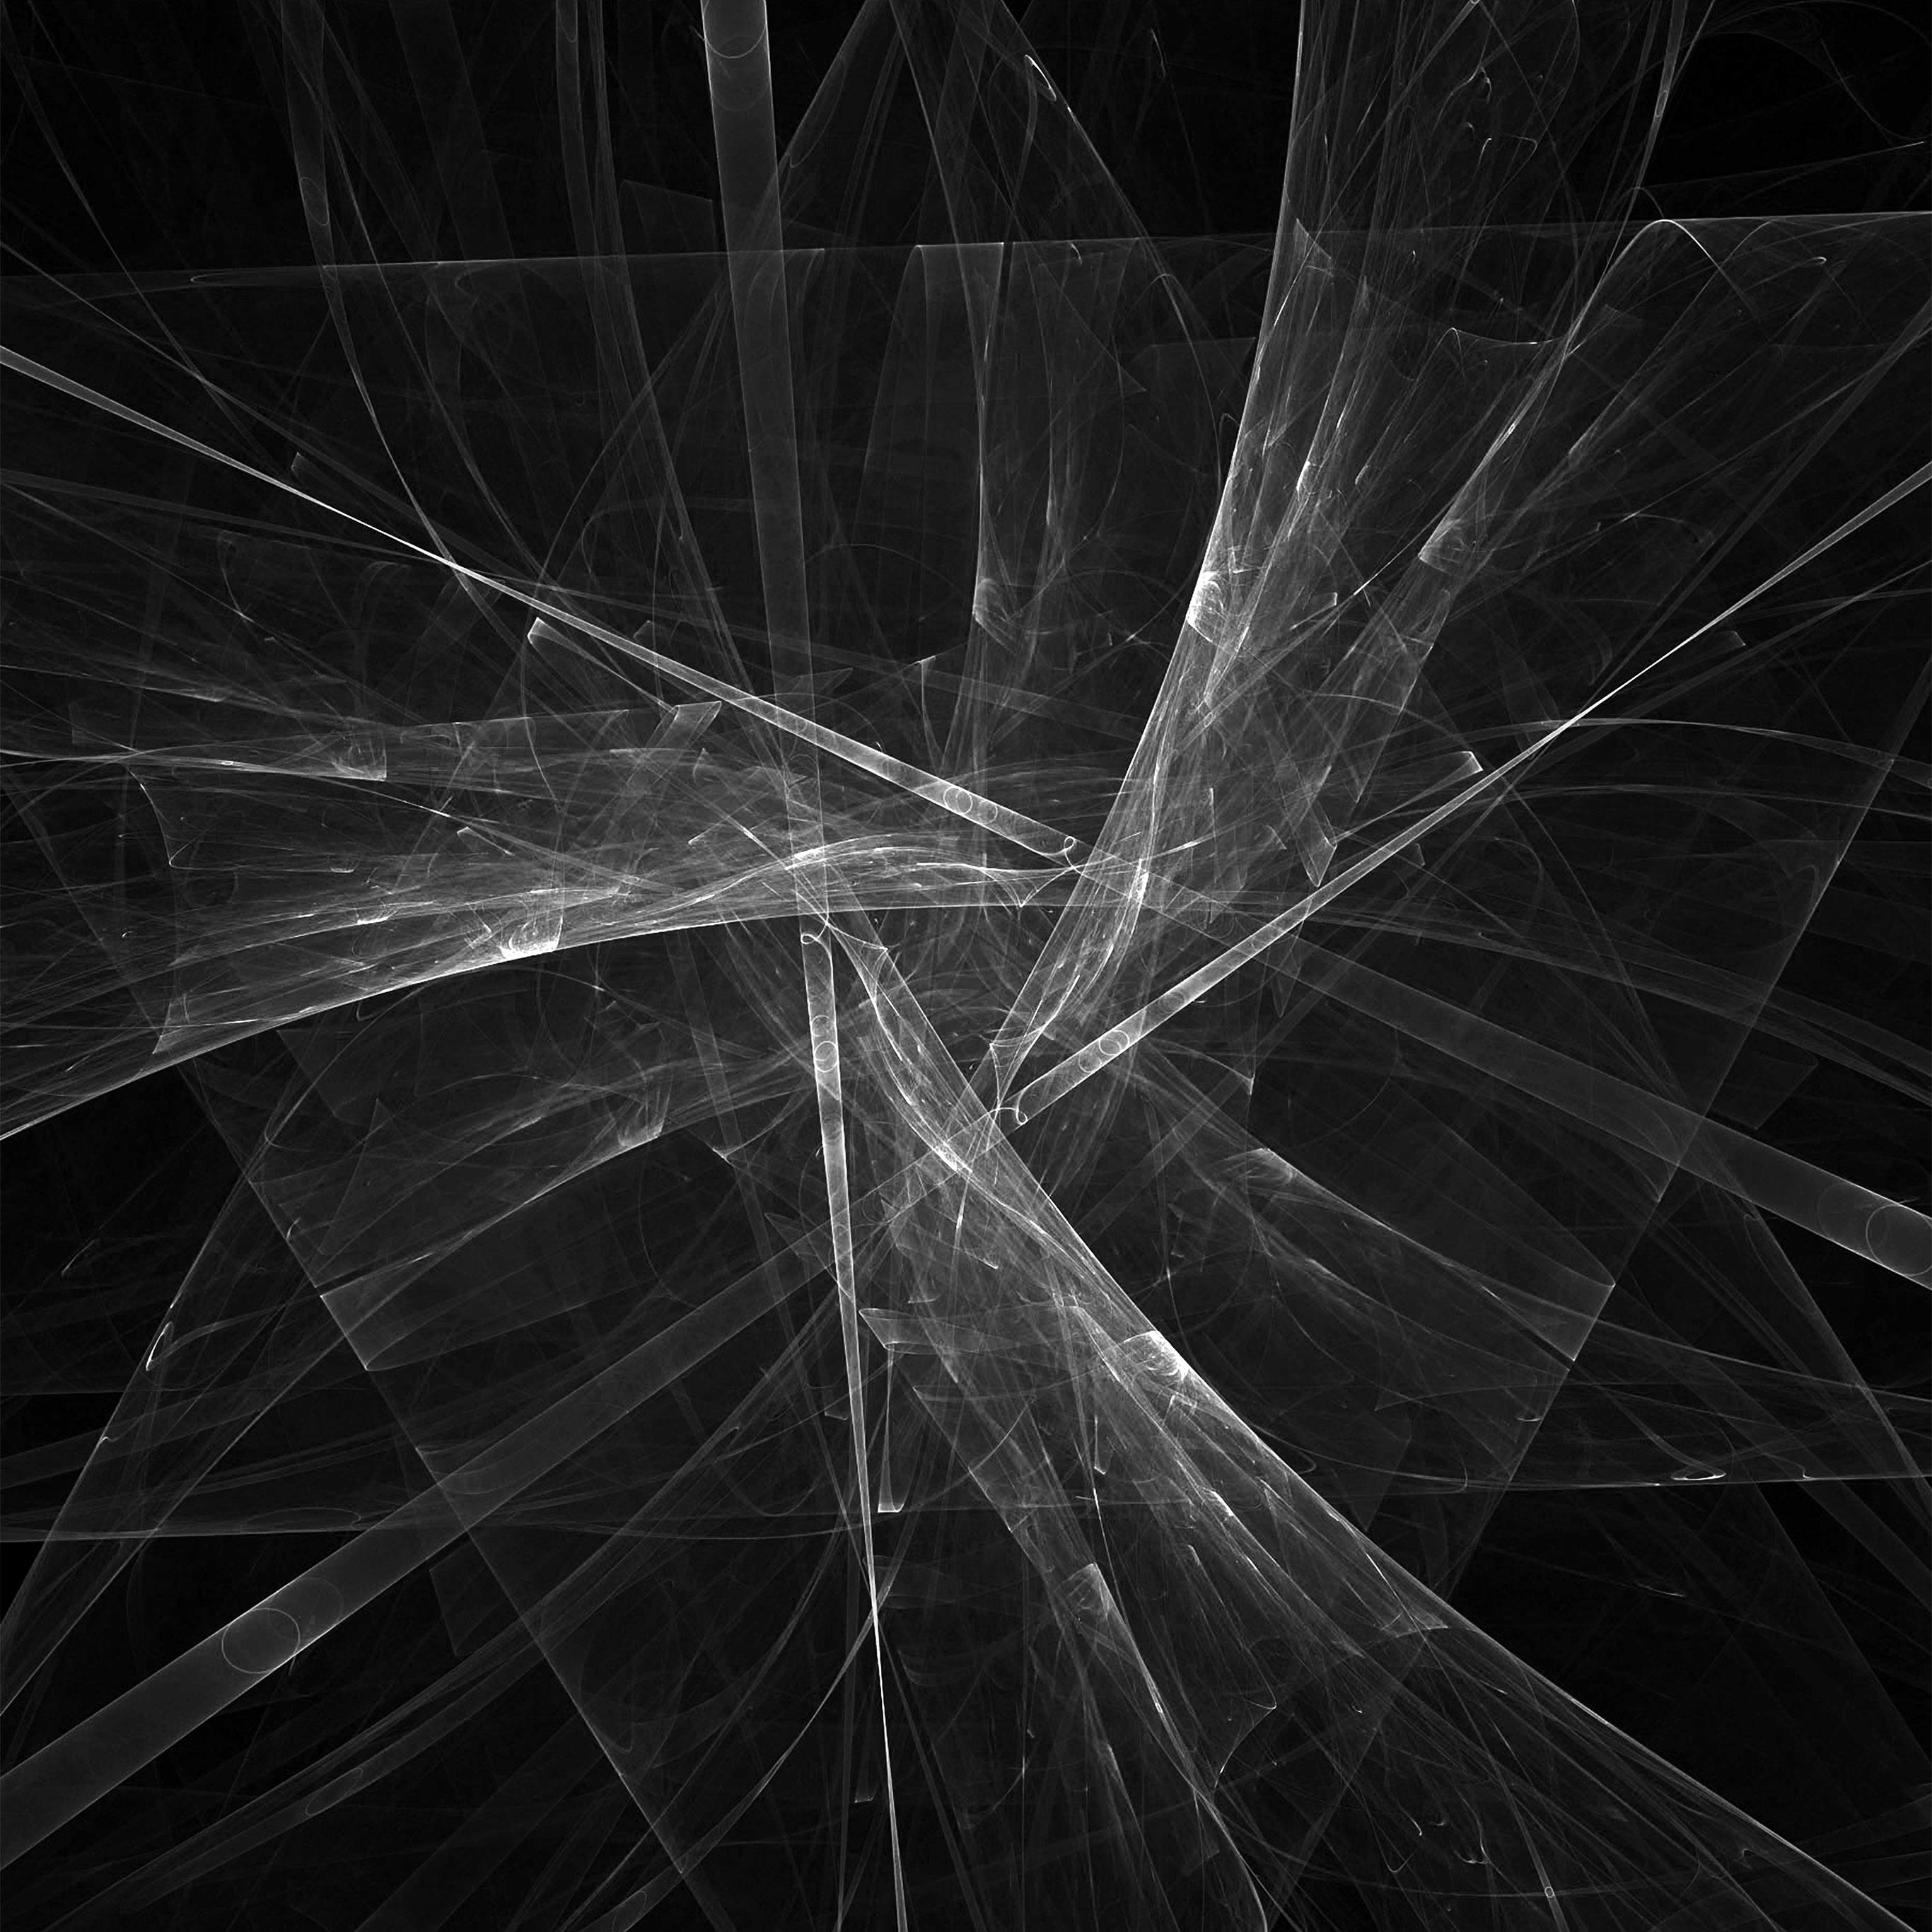 Dark Abstract - HD Wallpaper